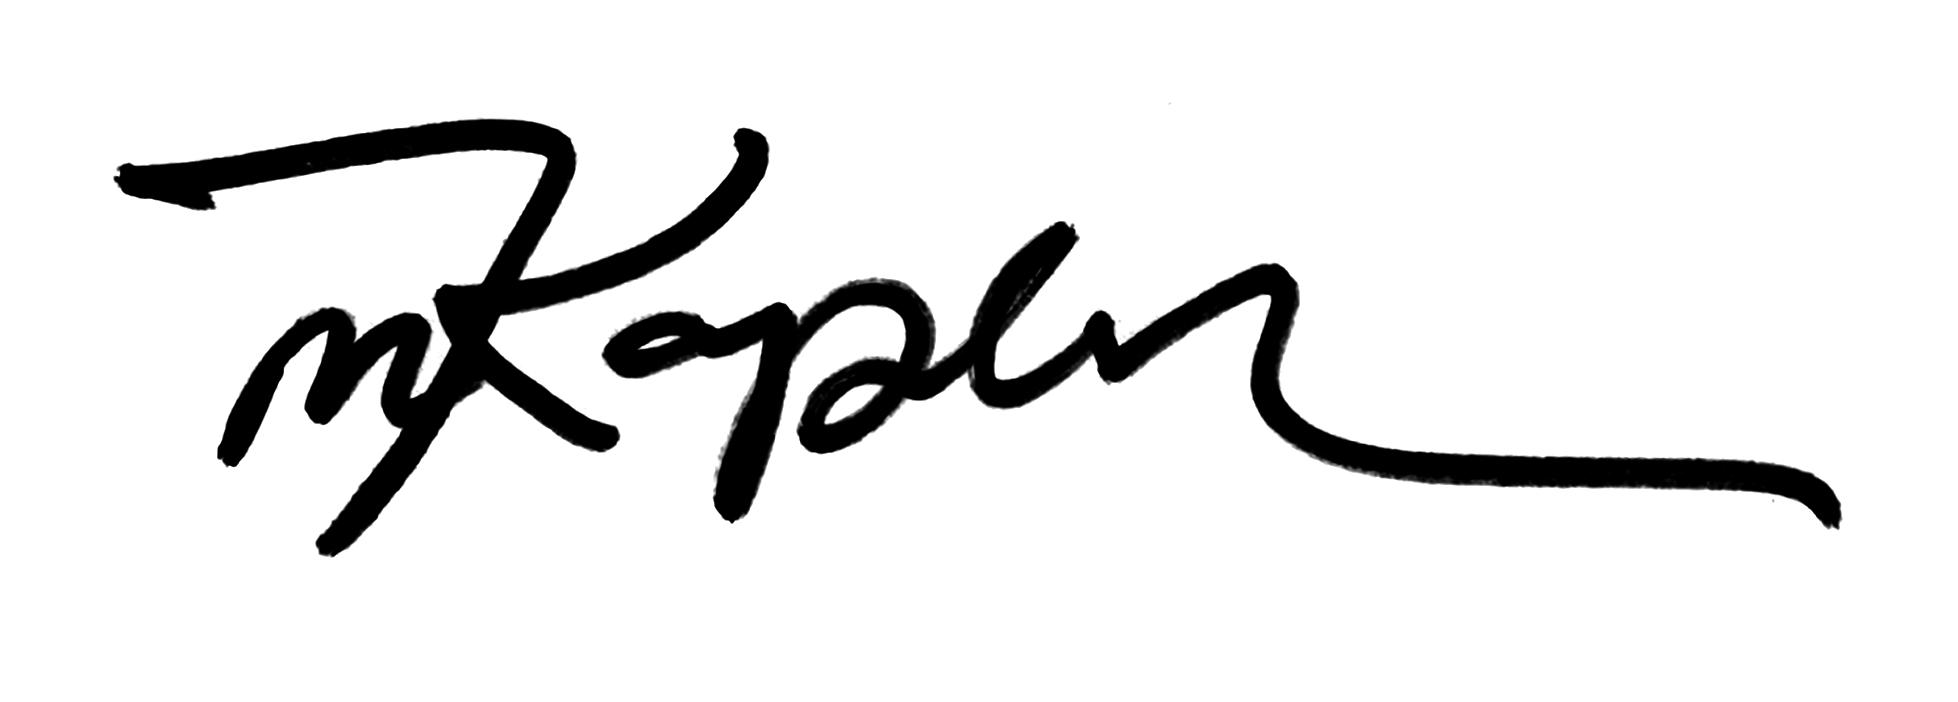 Handwritten signature Michael Kaplan